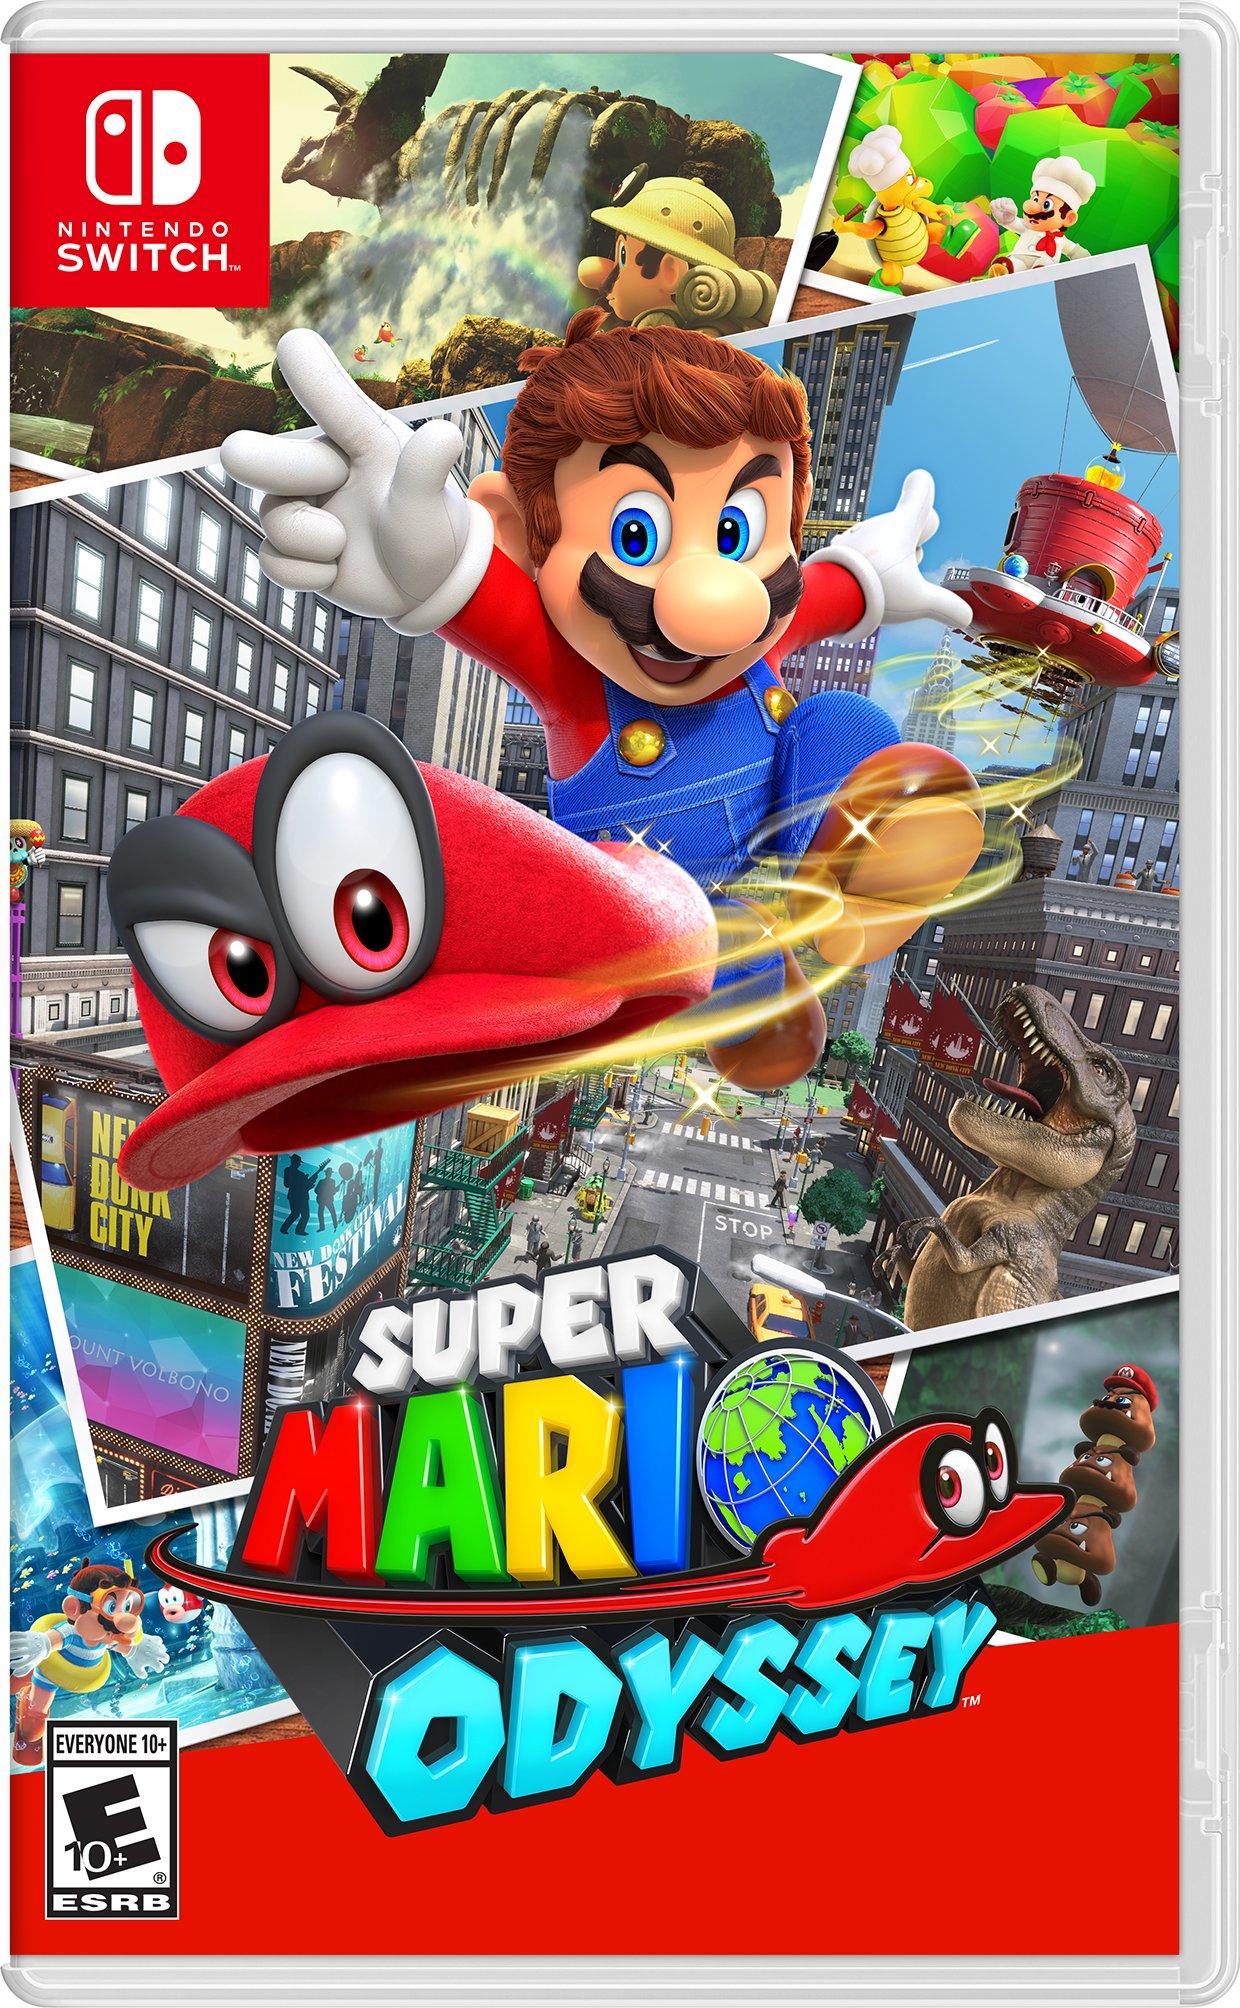 Amazon.com: Super Mario Odyssey - Nintendo Switch: Nintendo of ...